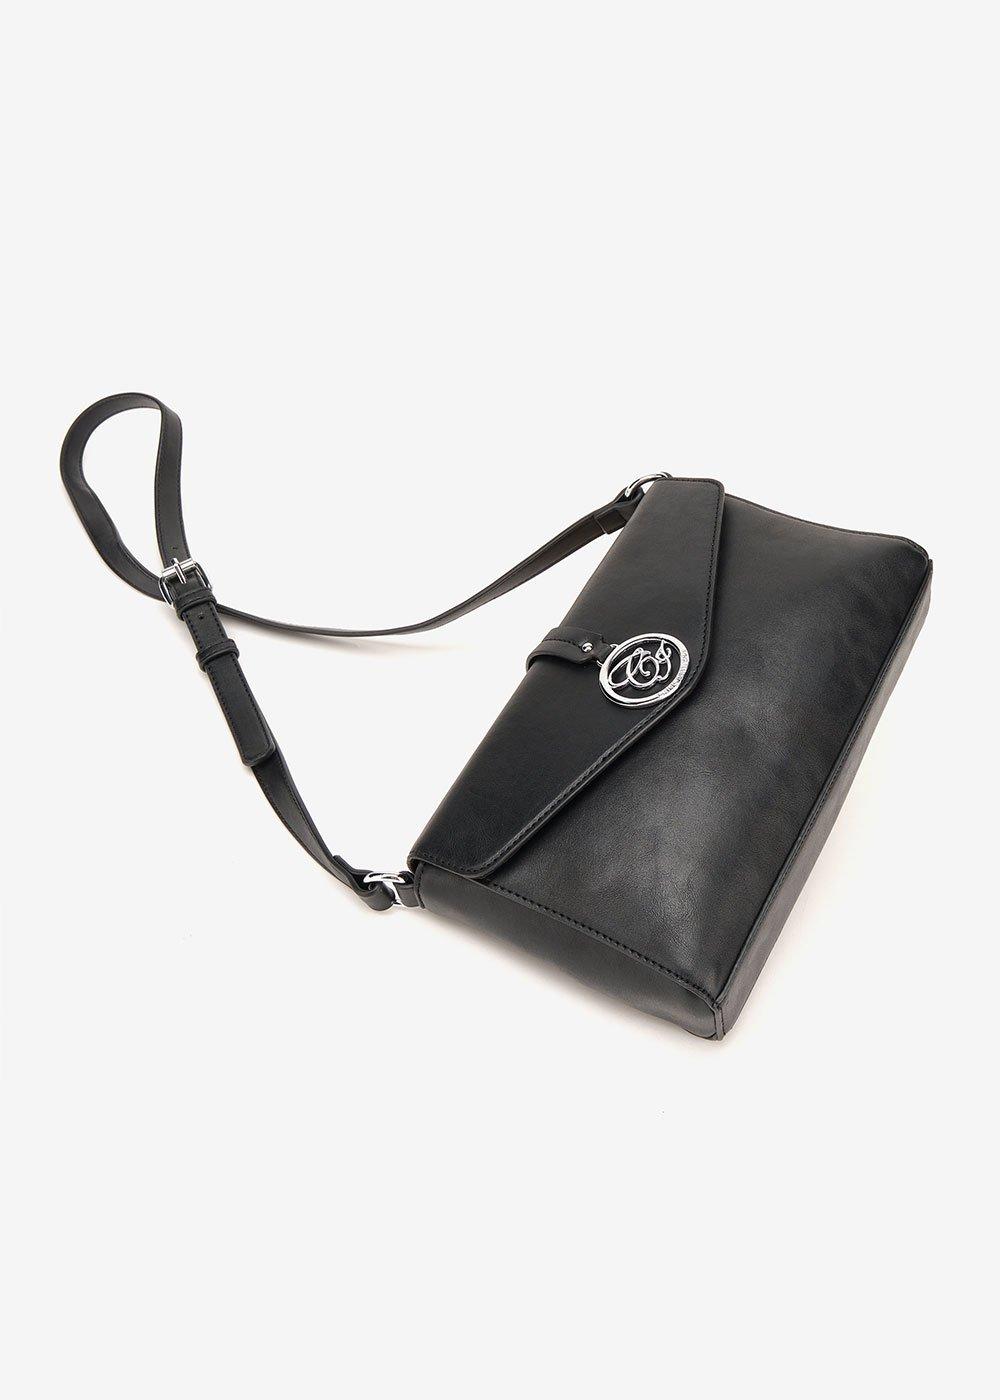 Bally shoulder bag with logo - Black - Woman